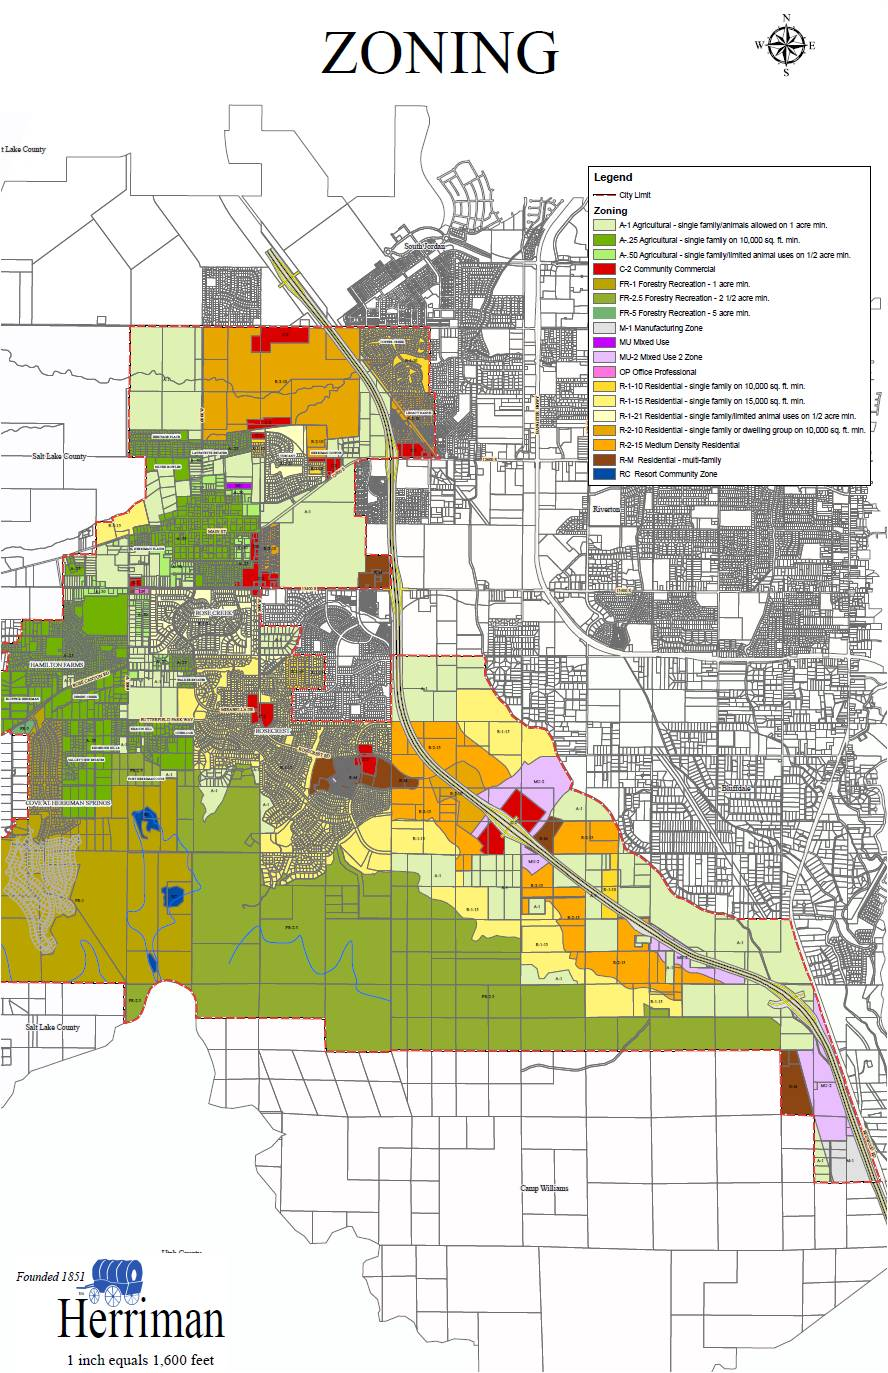 Salt lake city zoning map reproduced from mikedayherrimanleswordpress publicscrutiny Choice Image